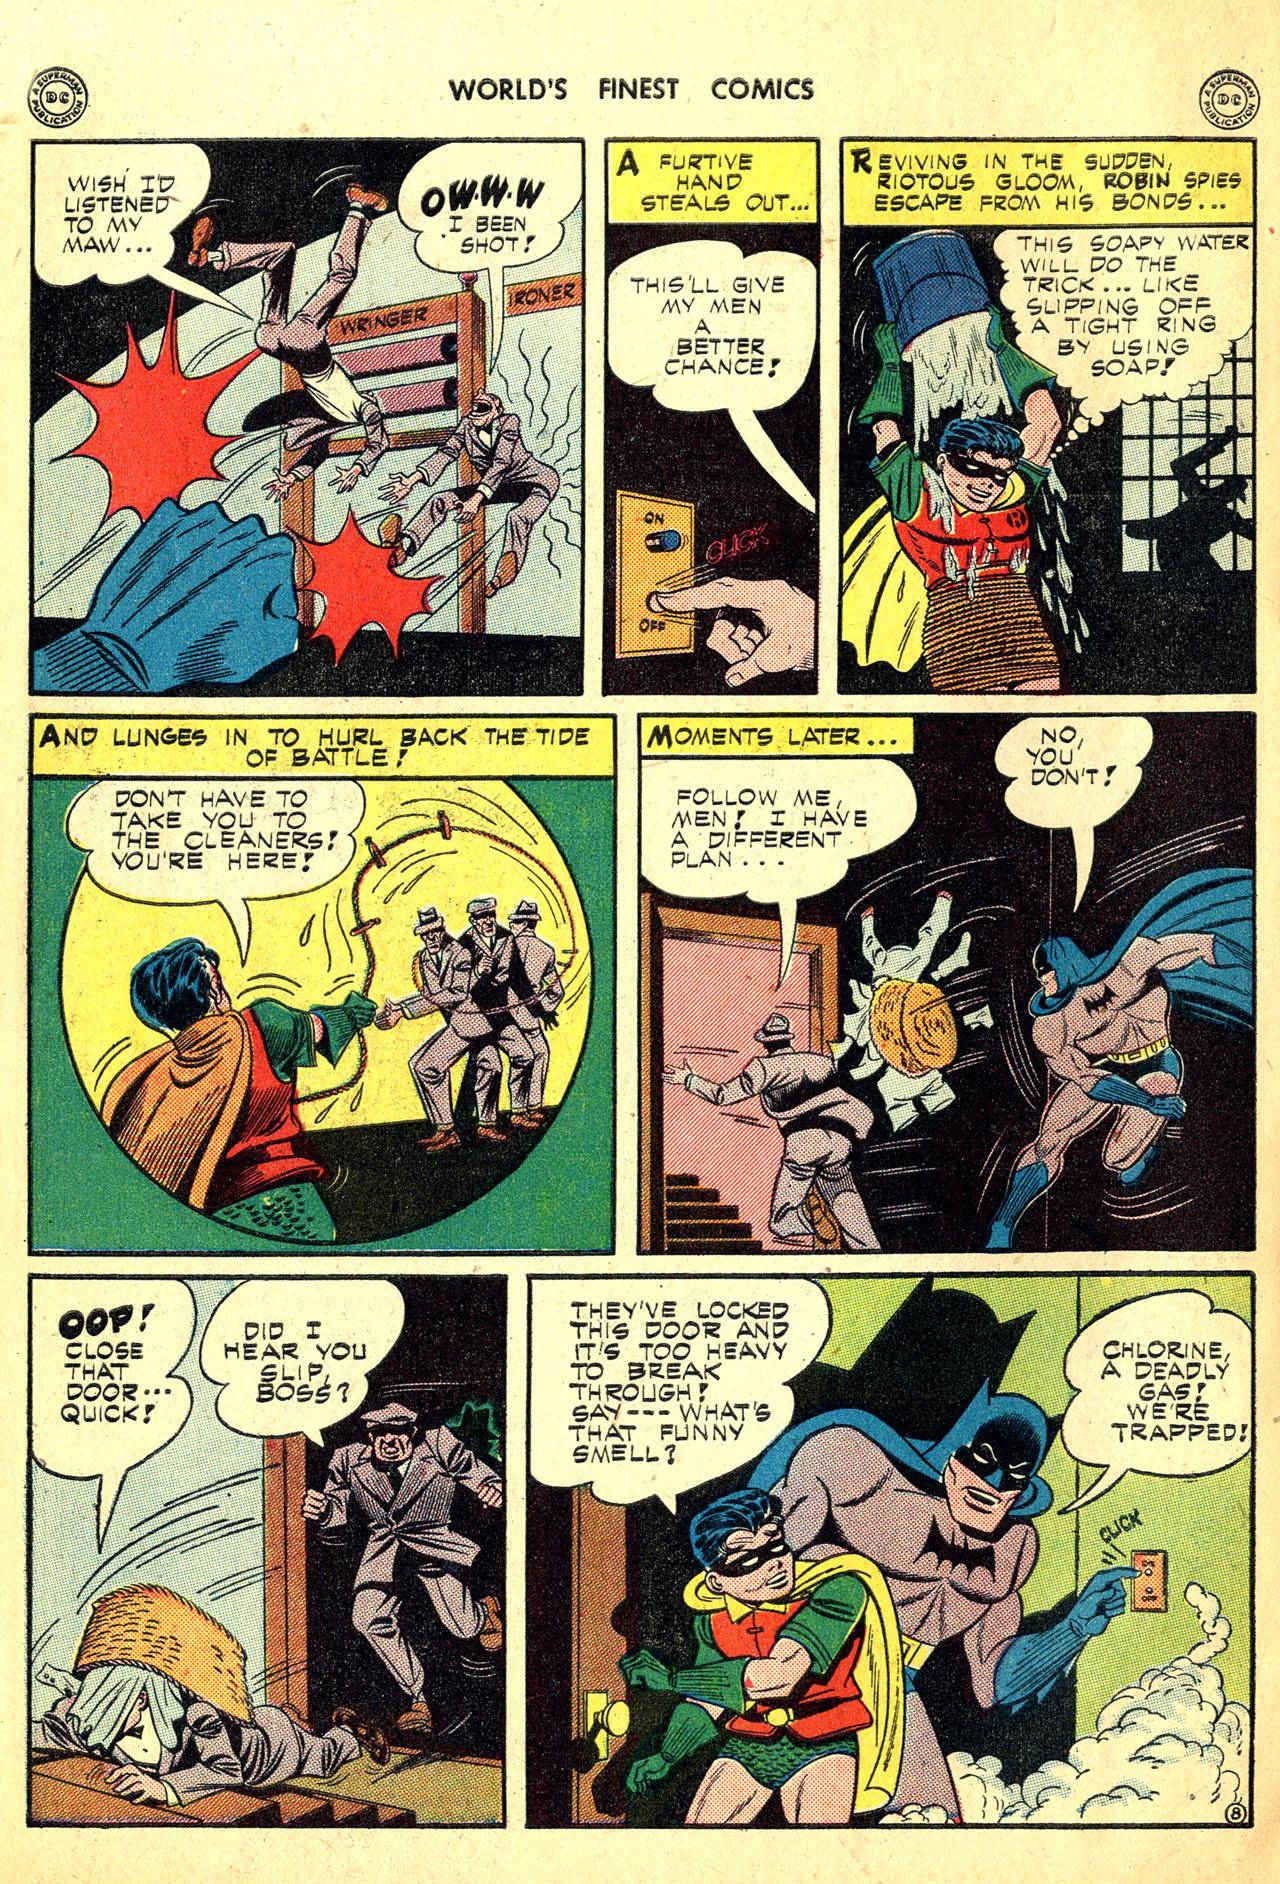 Read online World's Finest Comics comic -  Issue #18 - 76